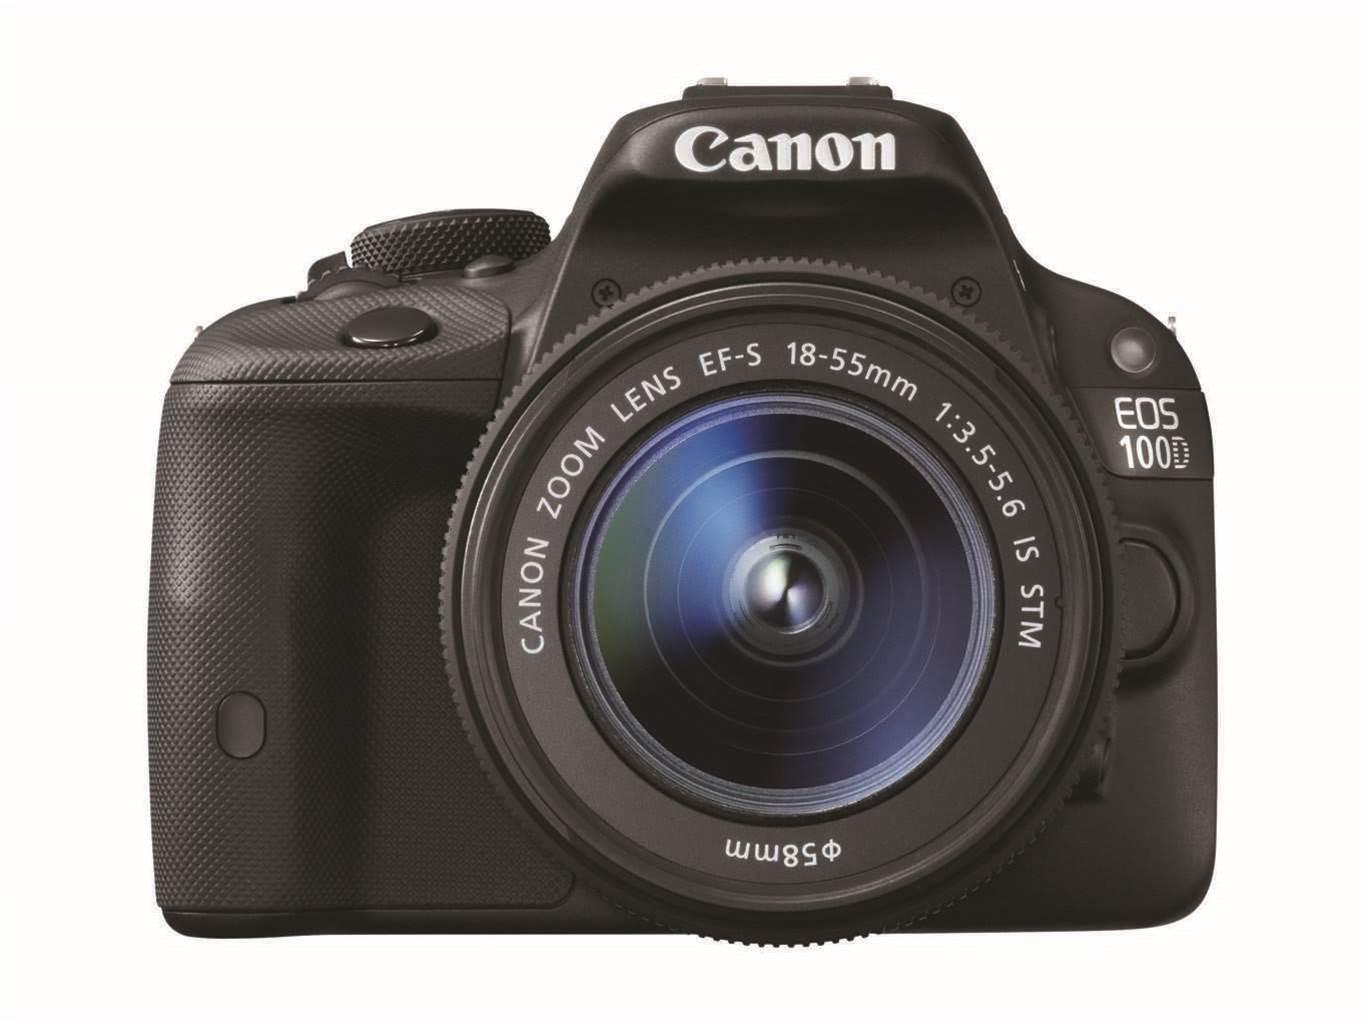 Review: Canon EOS 100D